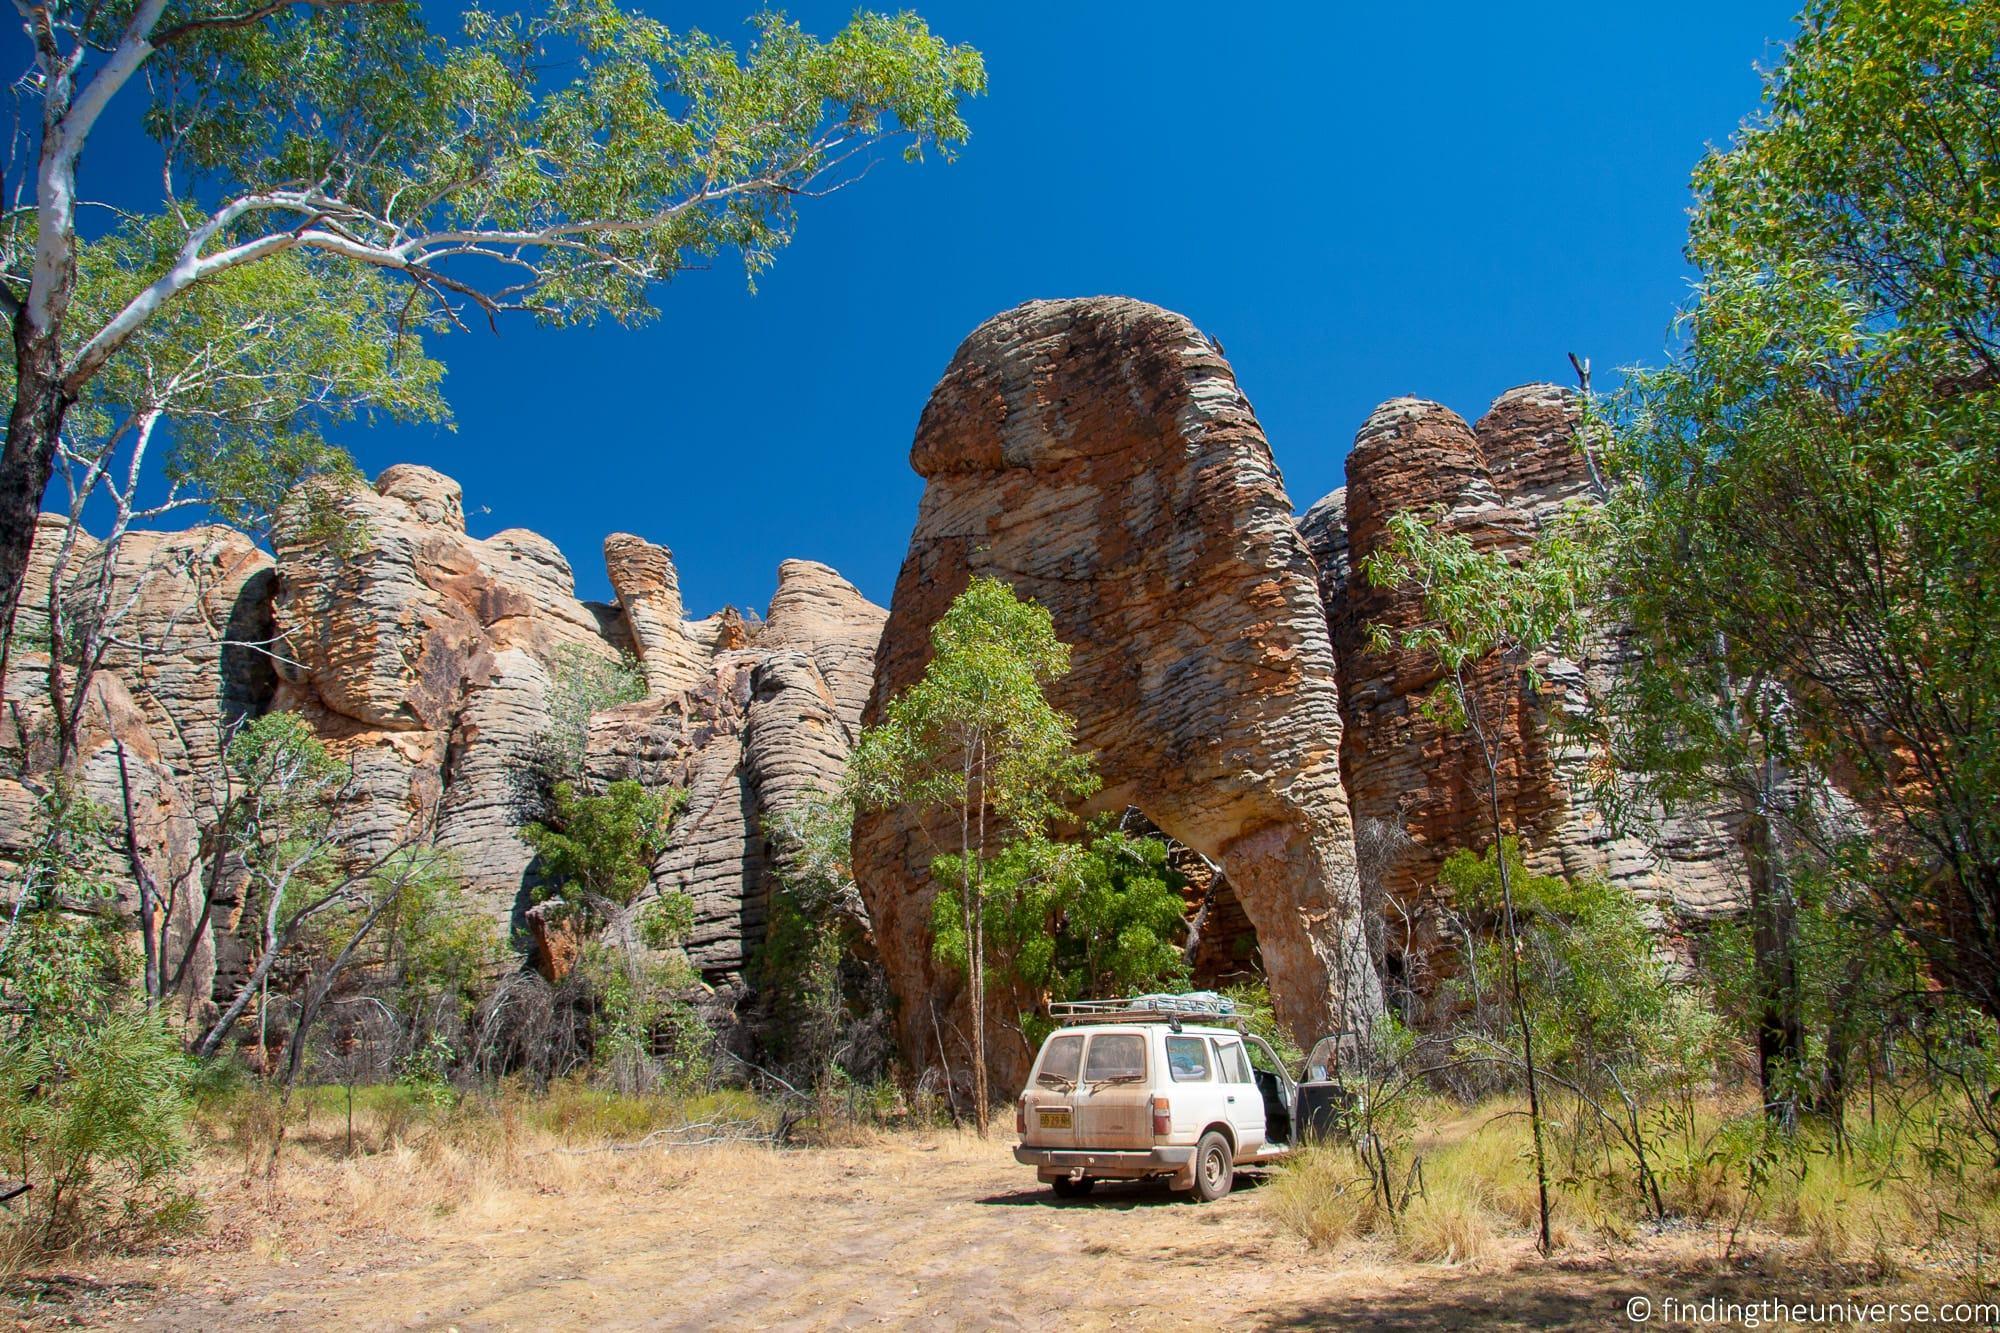 Alien Landscapes in Australia - Finding the Universe